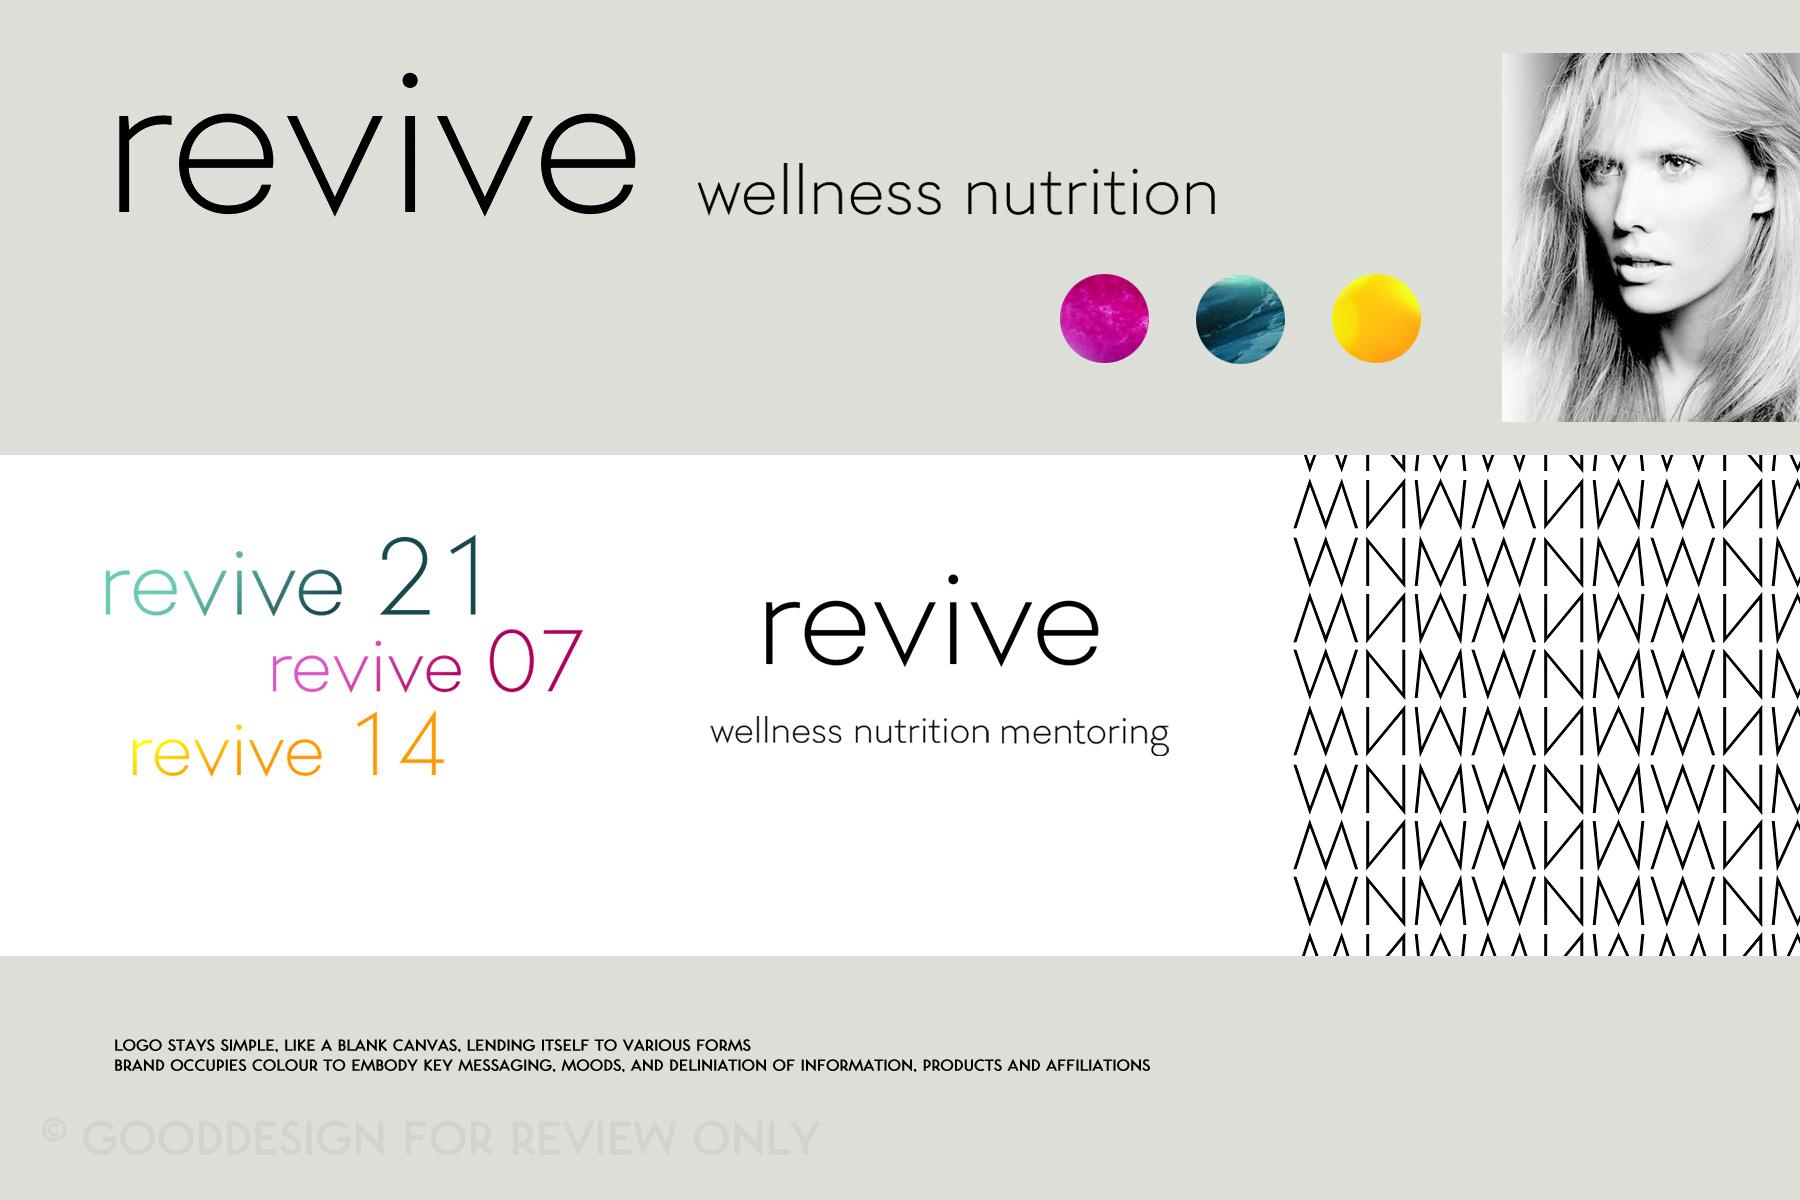 revive-brand-concept1-3.jpg